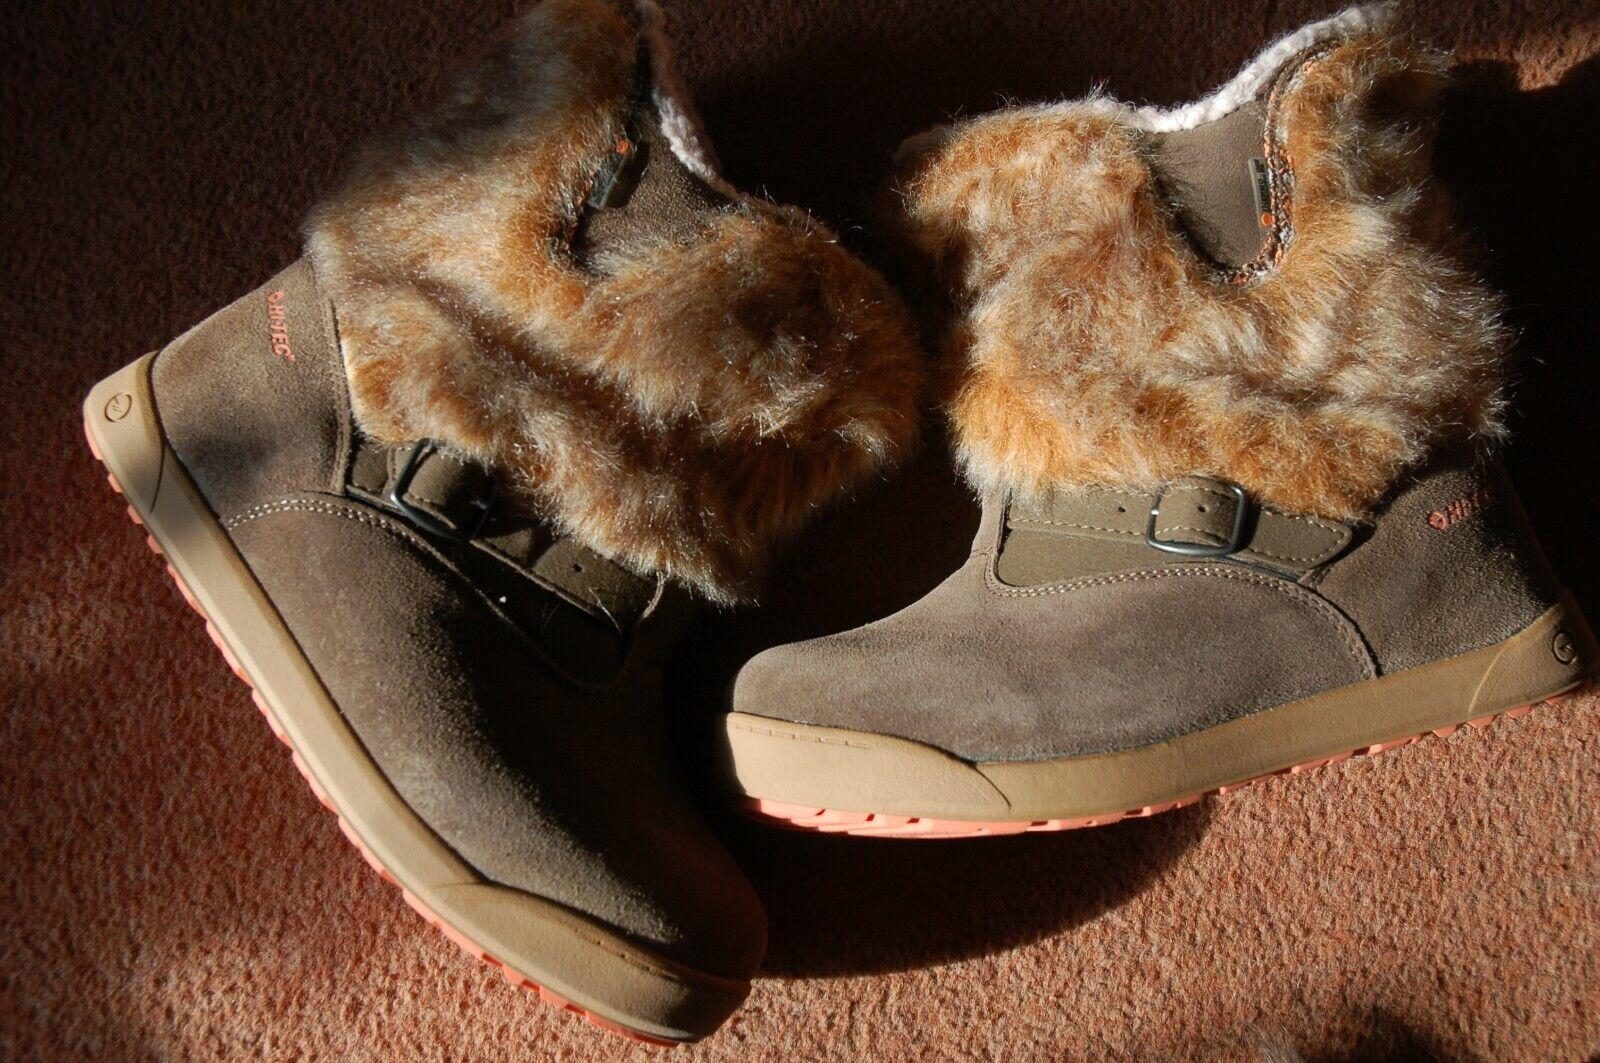 New UK 5 Hi-tec Fur Lined Suede Boots With Faux Fur Cuff Zip Backs Big-Fit